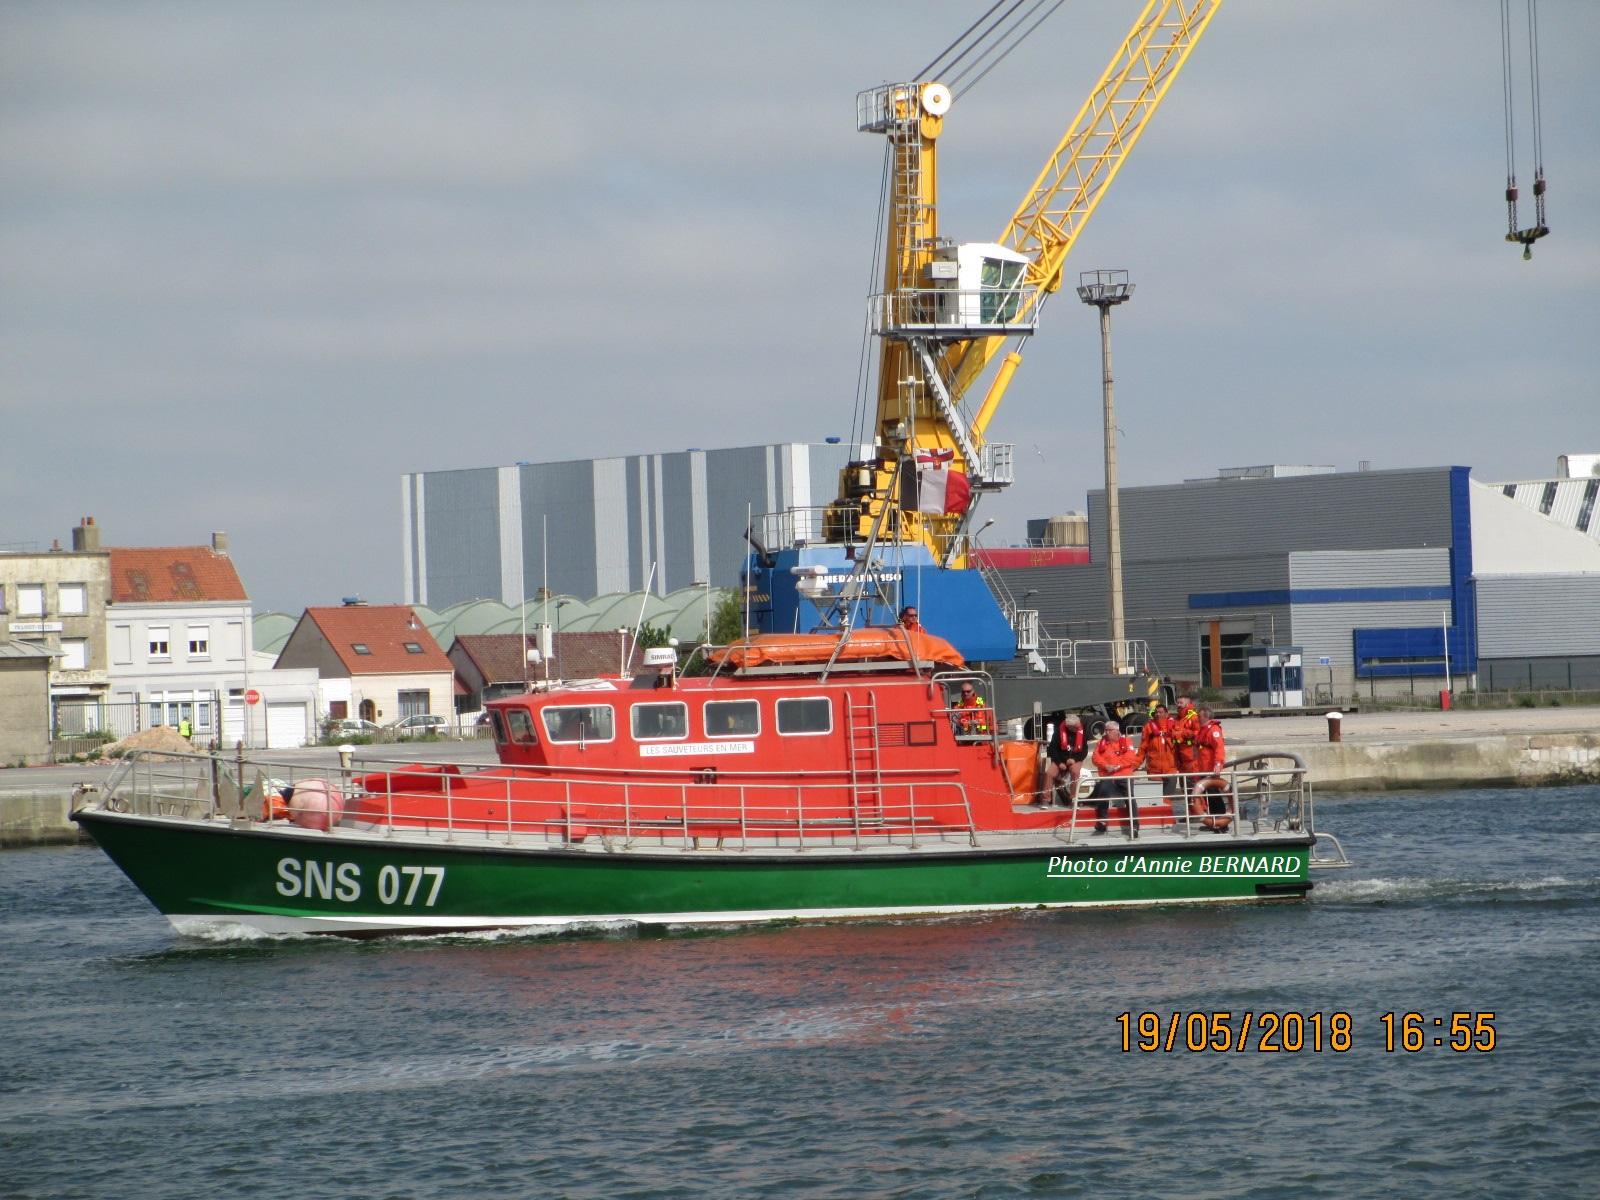 La SNS  077 de Calais